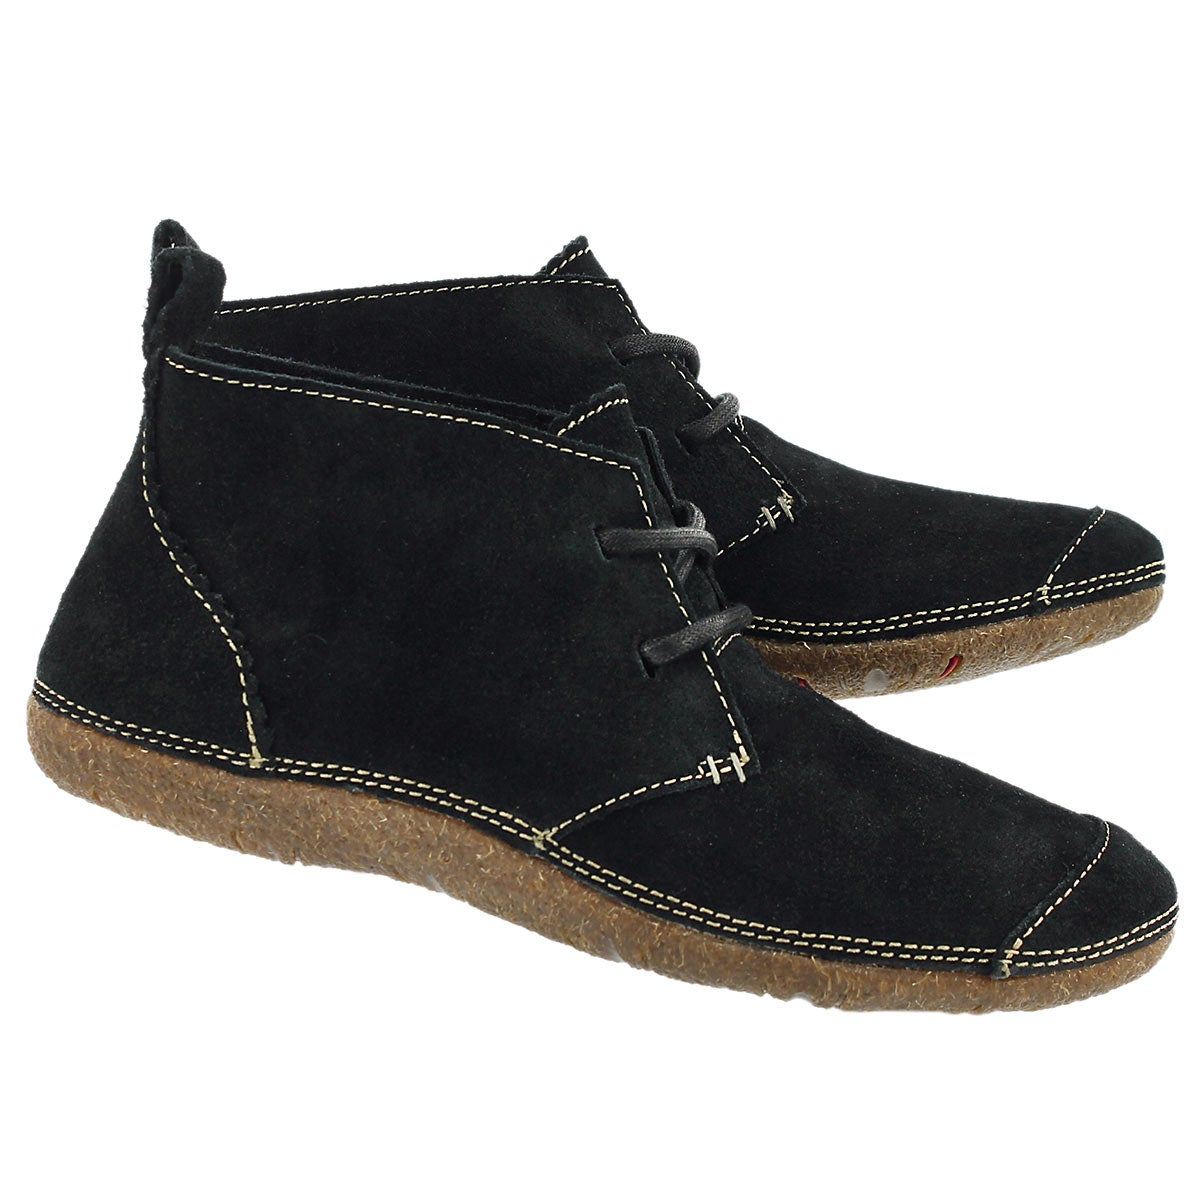 Lds Mindset black suede chukka boot